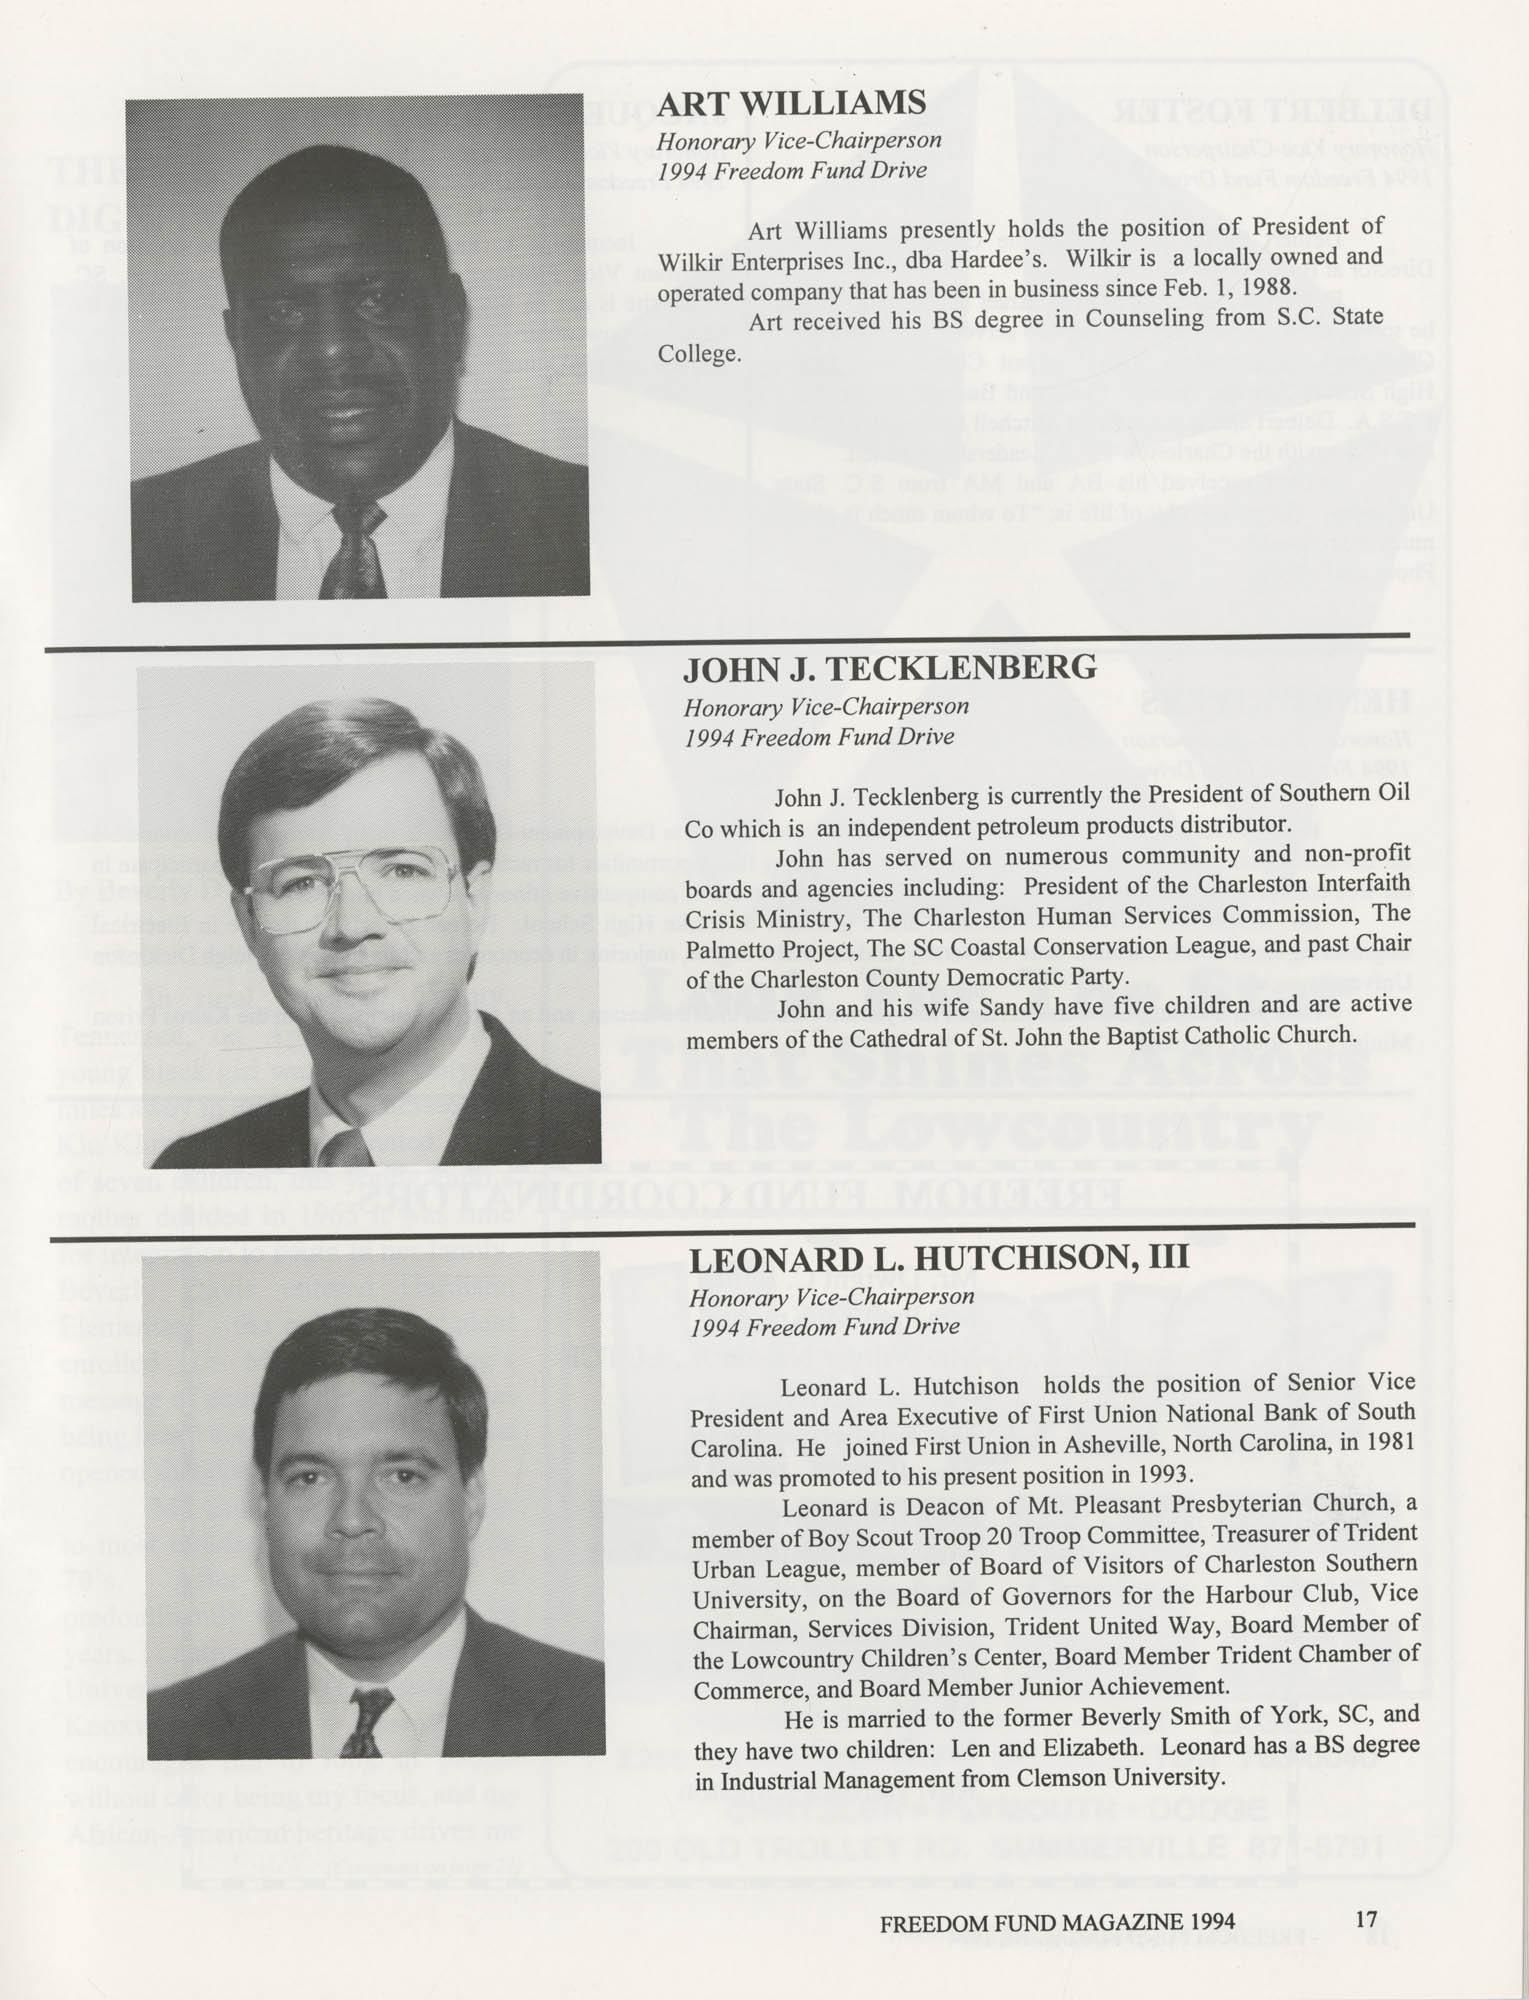 Freedom Fund Magazine, 1994, Page 17